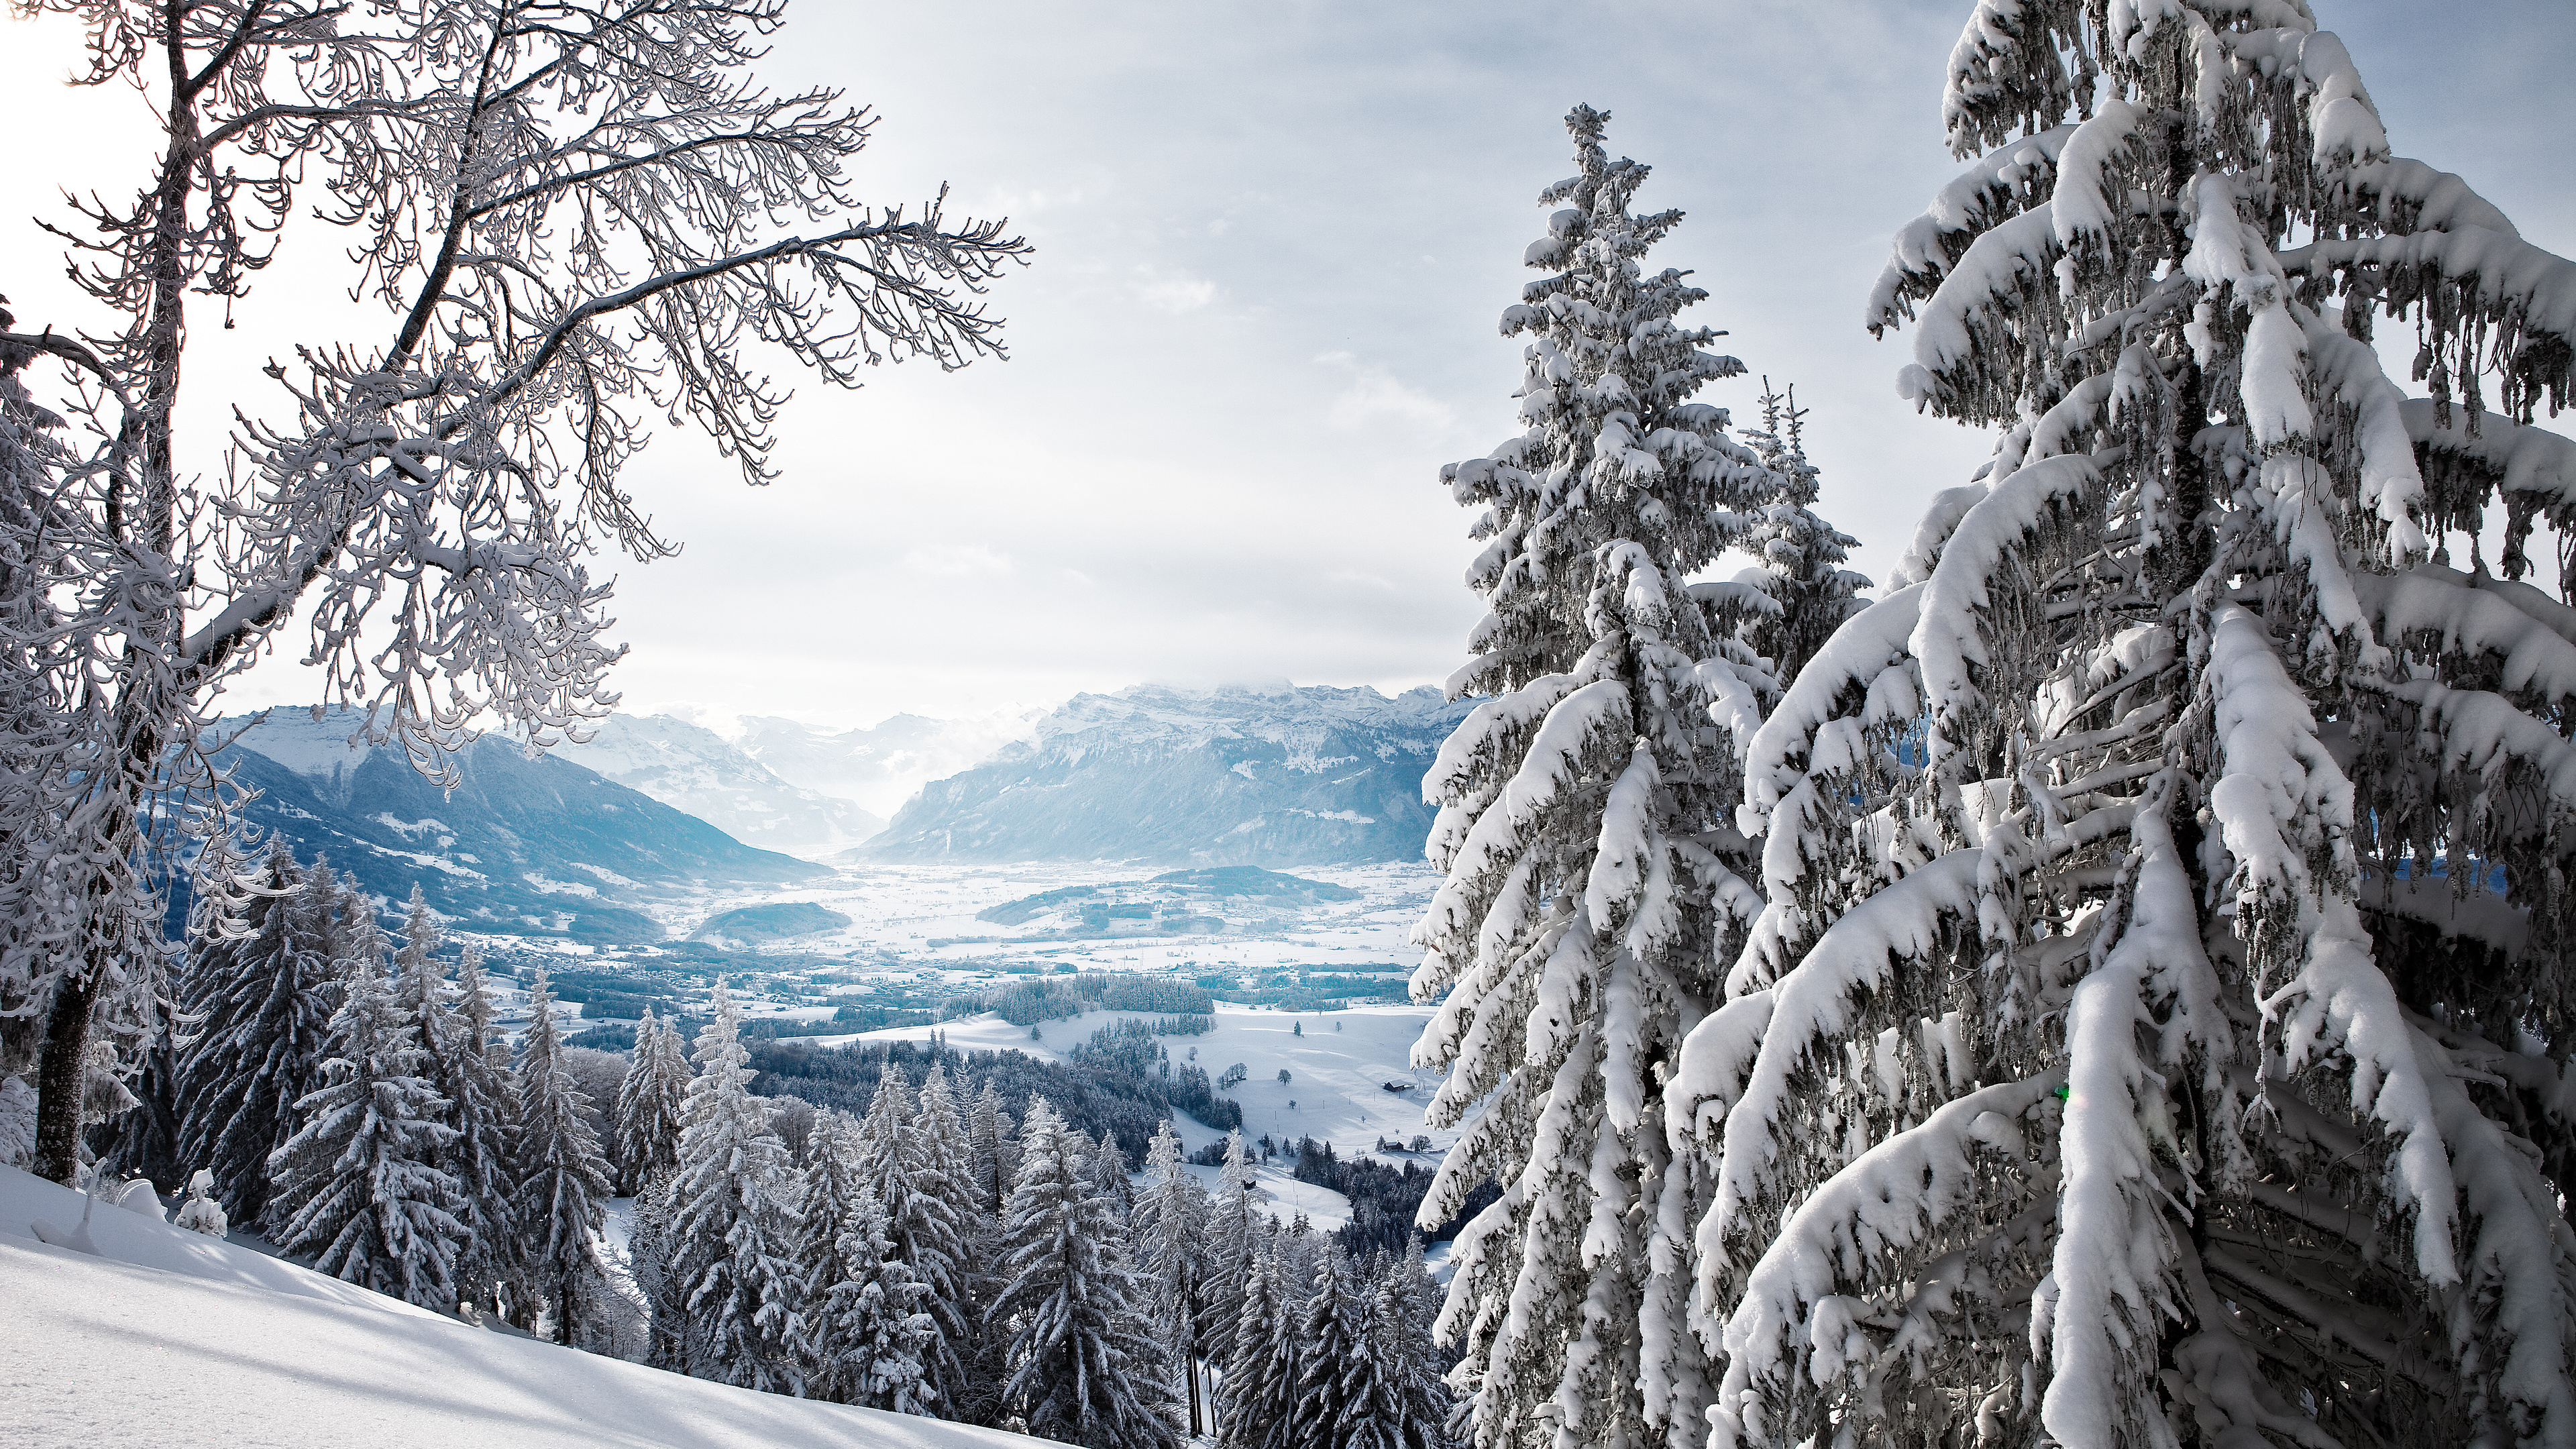 Winter Mountains 4k